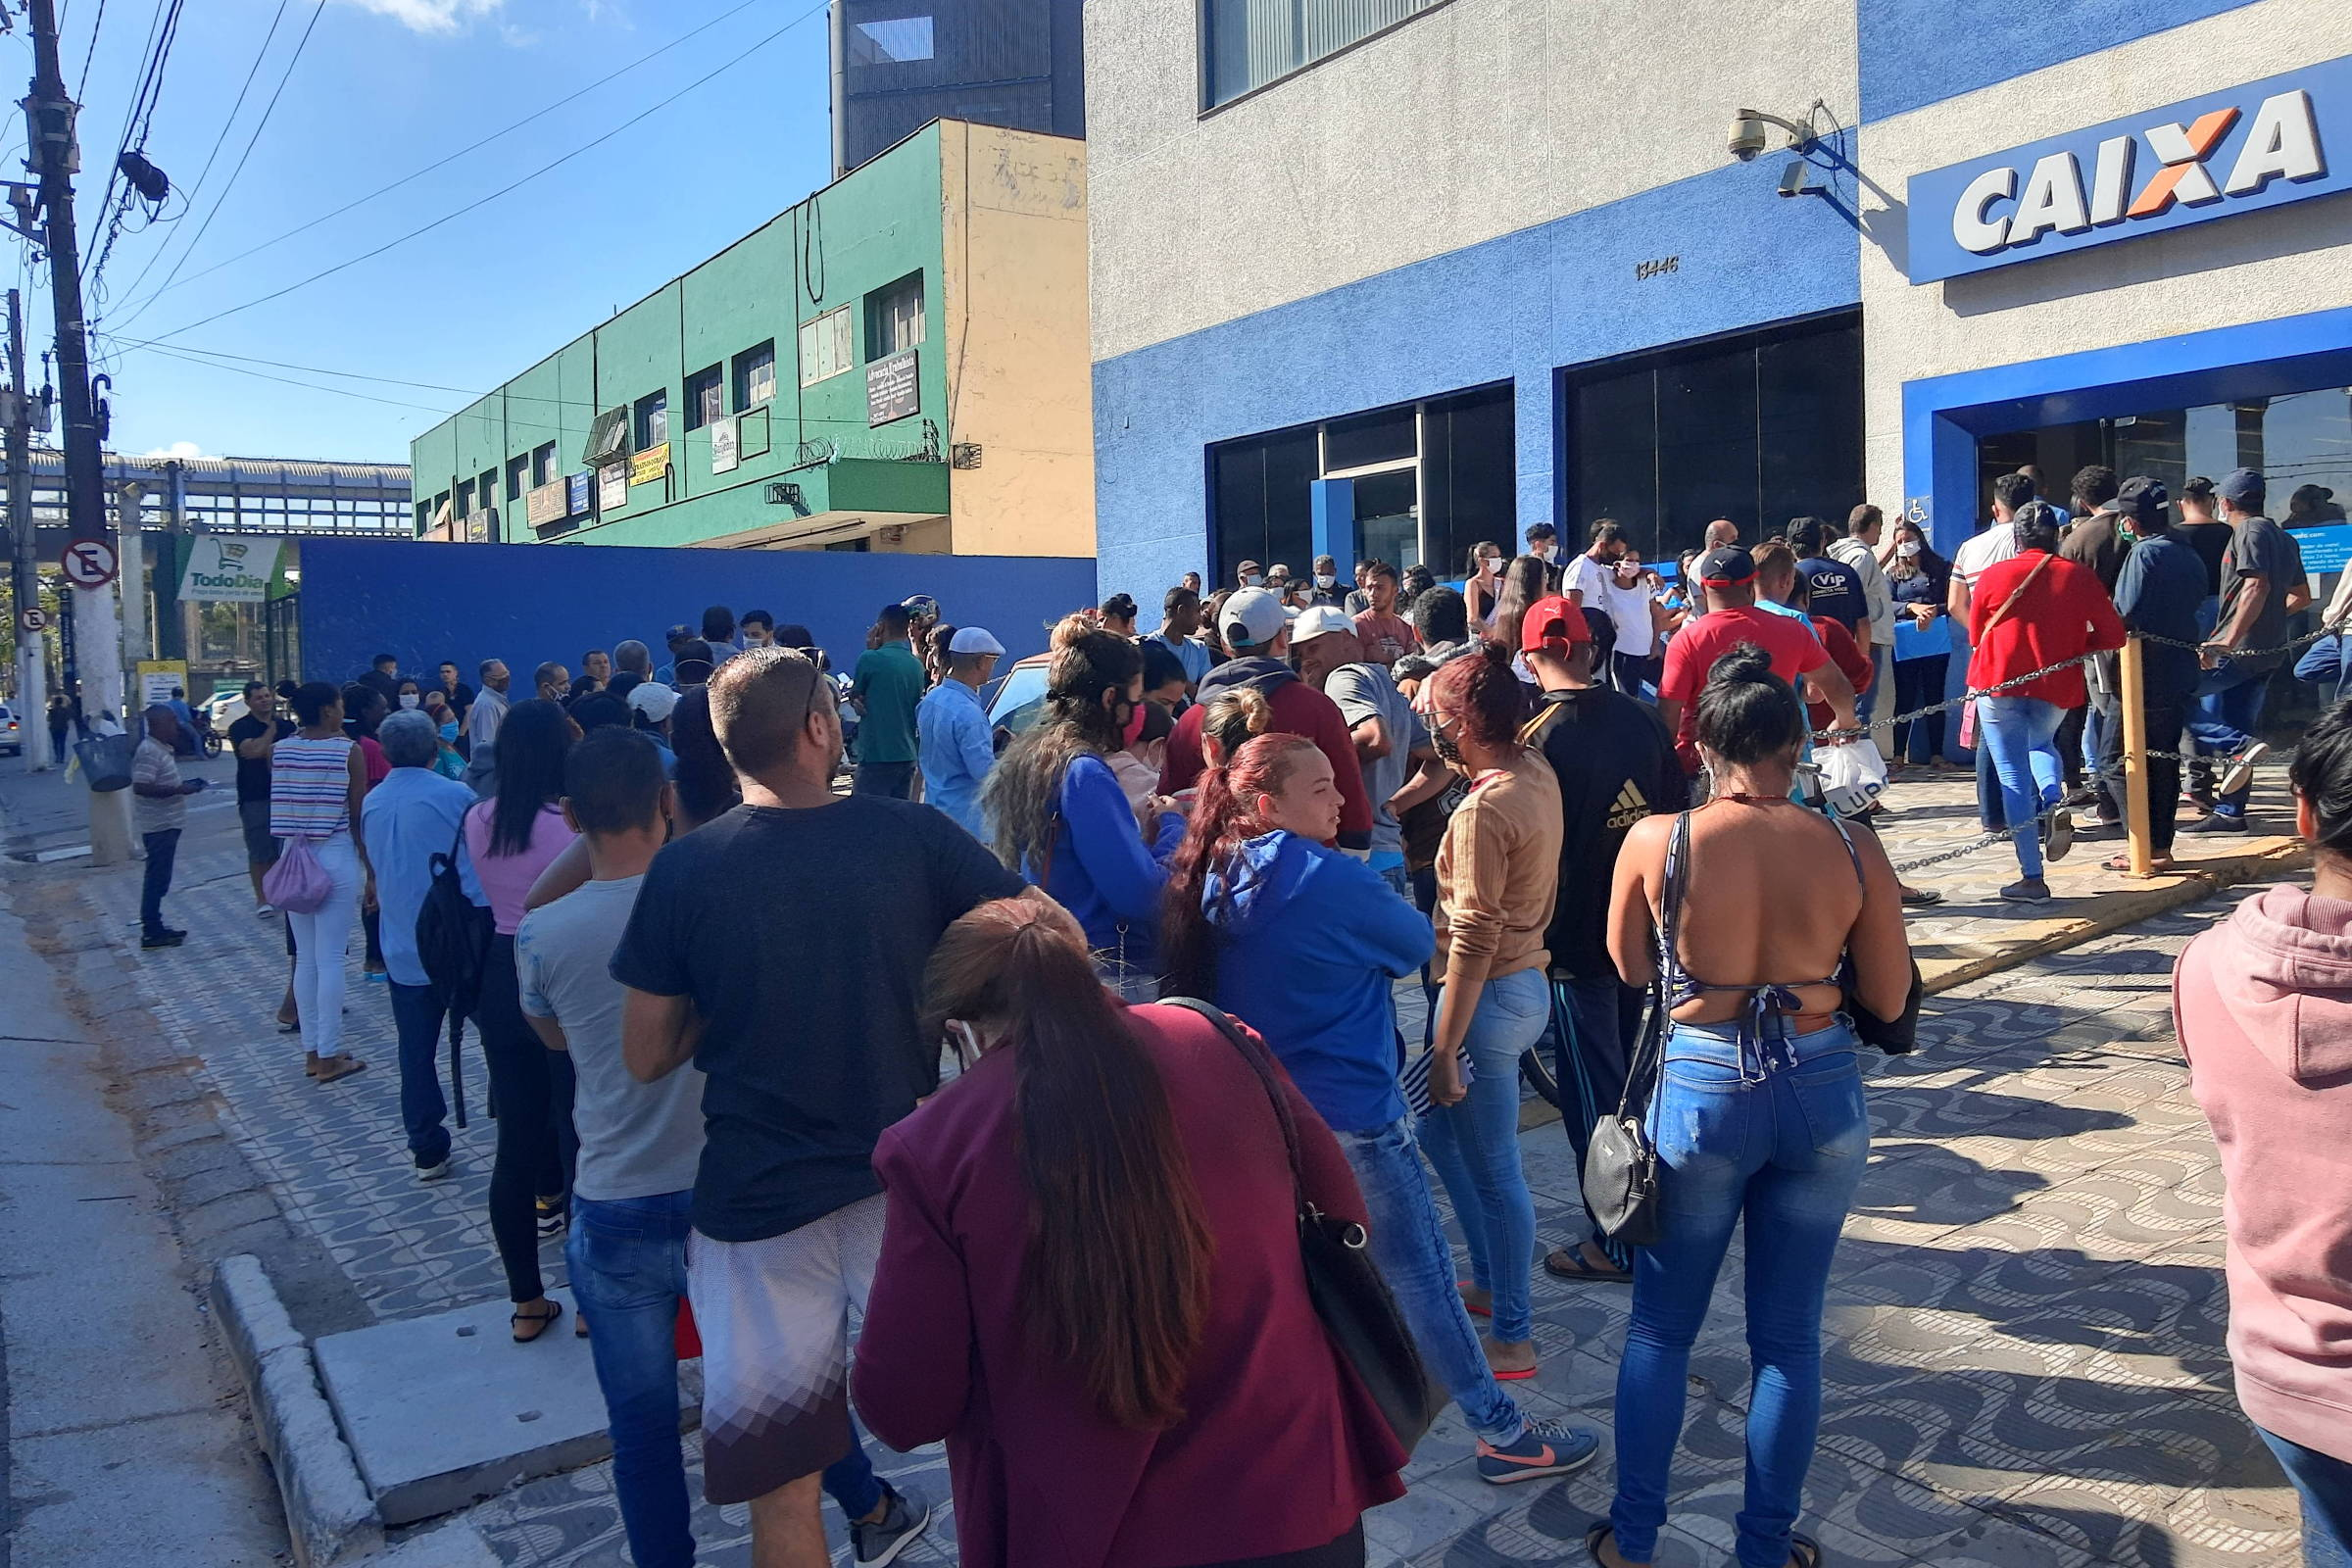 Grupo defende imposto sobre ricos para prorrogar auxílio emergencial